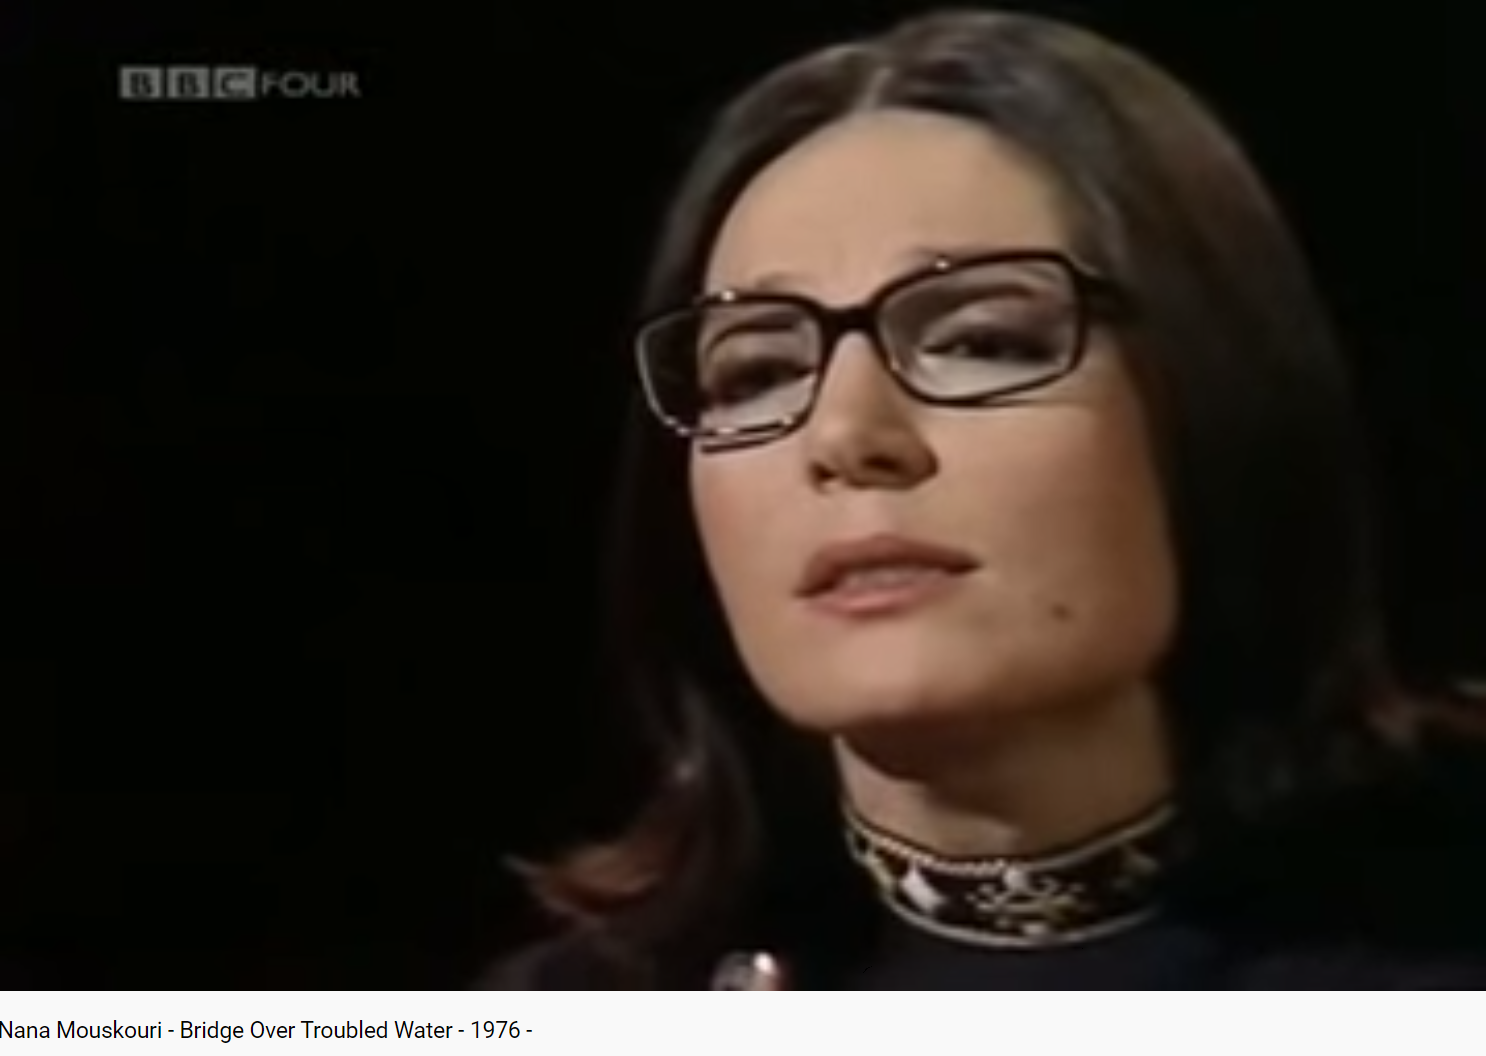 Nana Mouskouri Like a bridge over troubled water